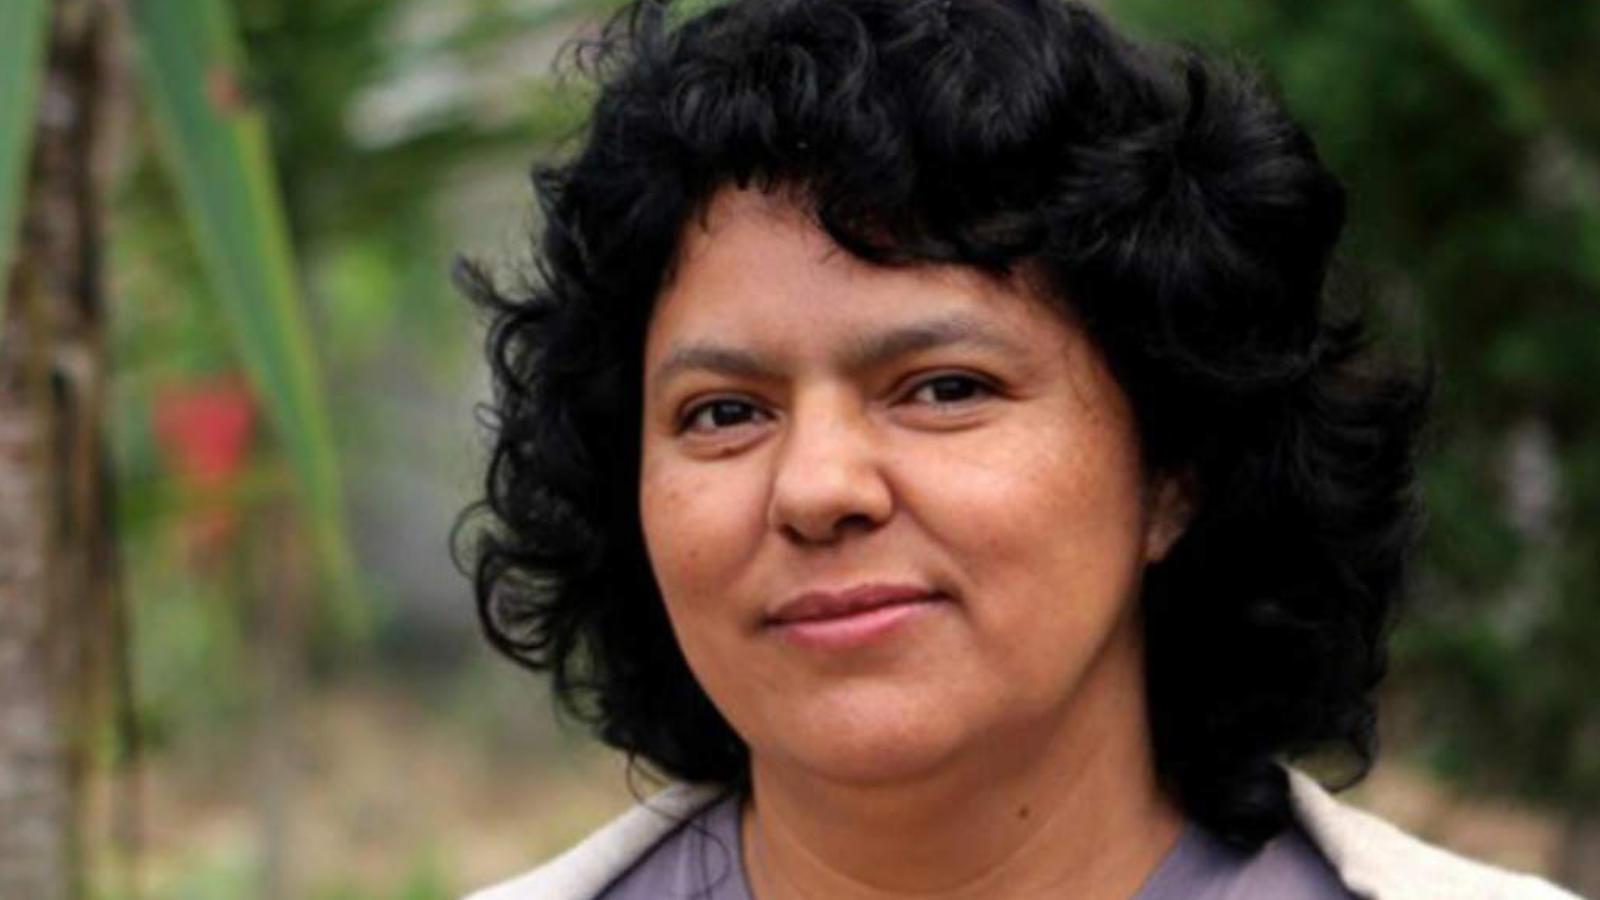 Berta Cáceres, Photo: Justice for Berta